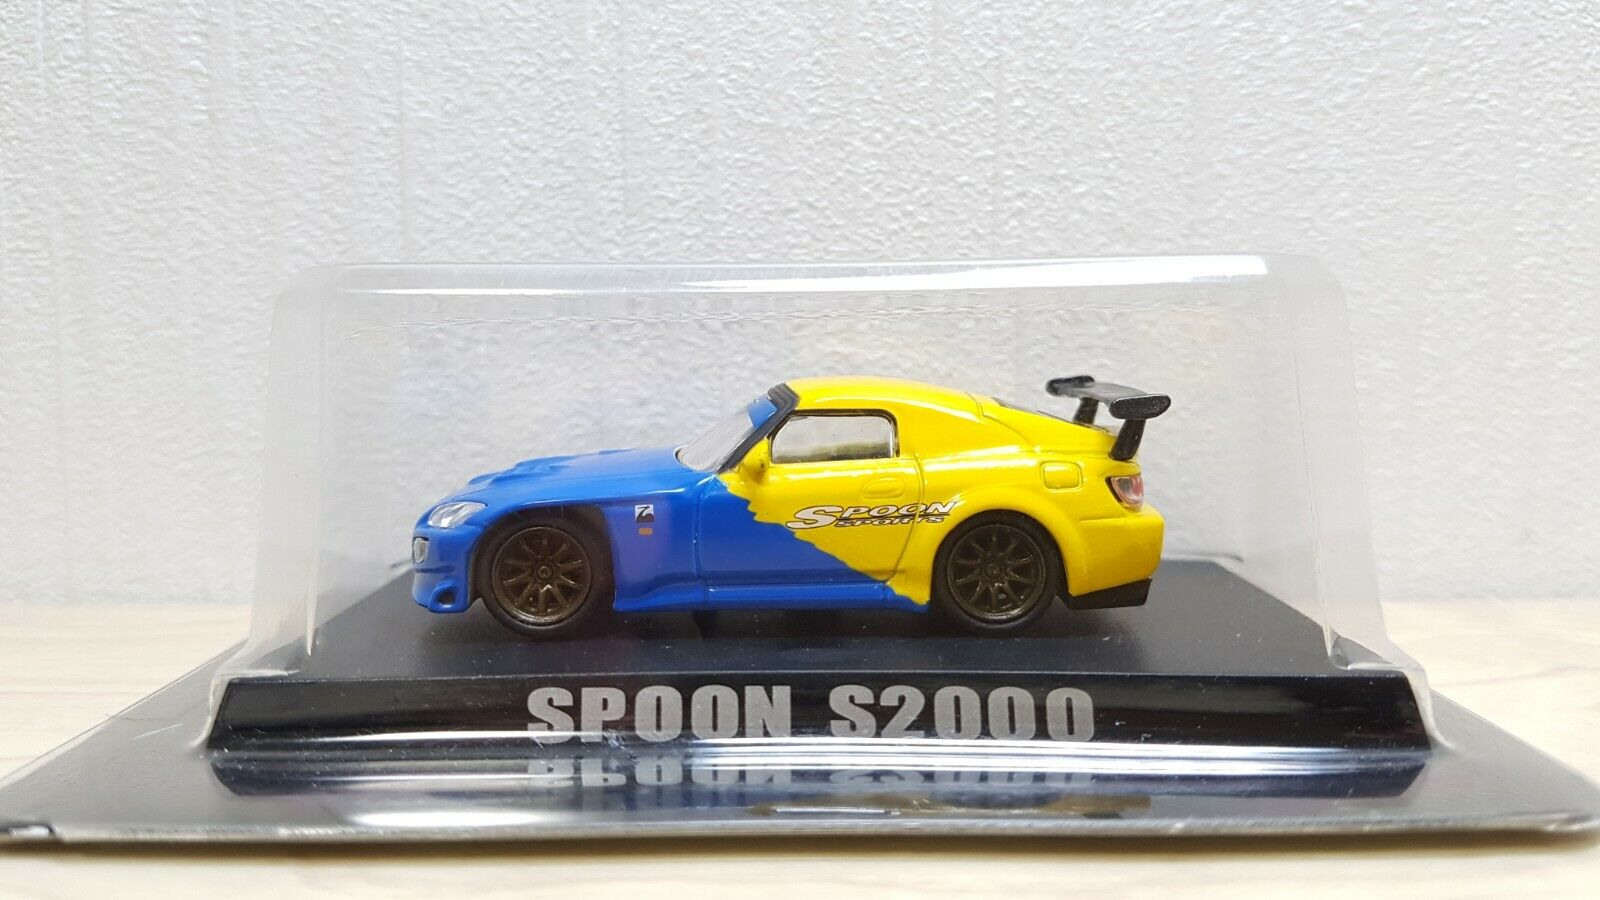 1 64 Aoshima OPTION HONDA SPOON S2000 Blau Gelb diecast car model